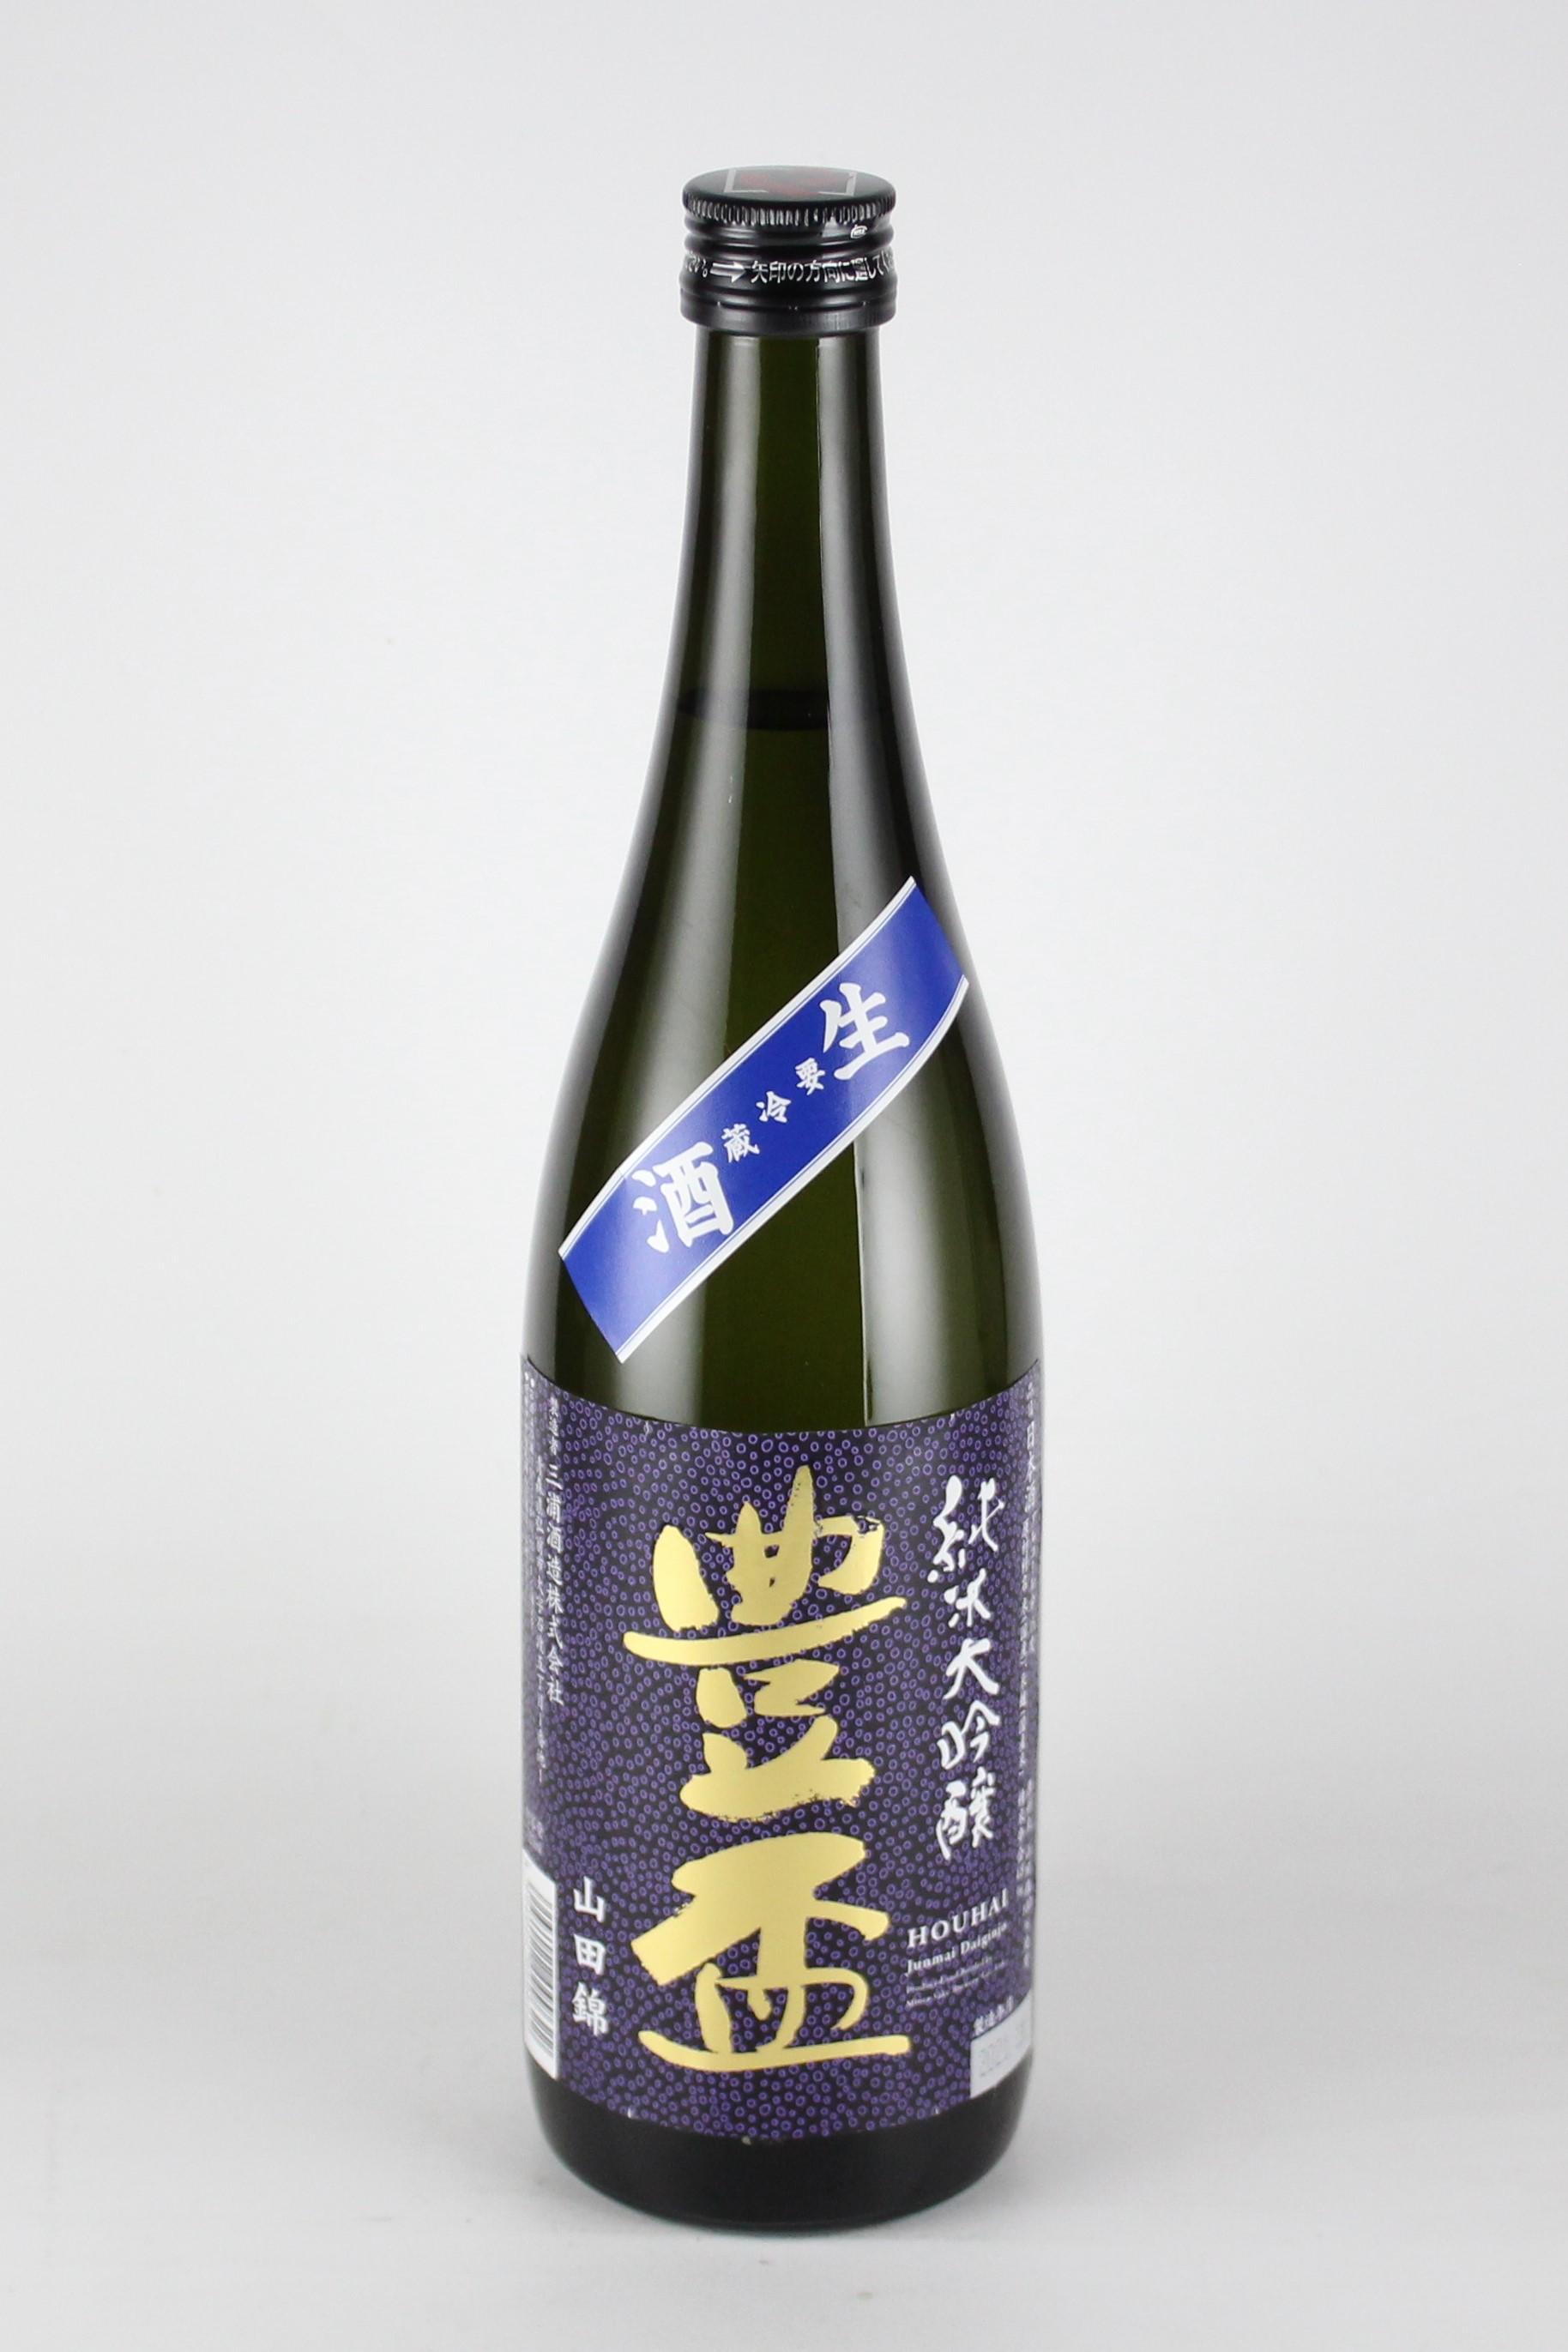 豊盃 紫ななこ塗 純米大吟醸生酒 山田錦48 720ml 【青森/三浦酒造】